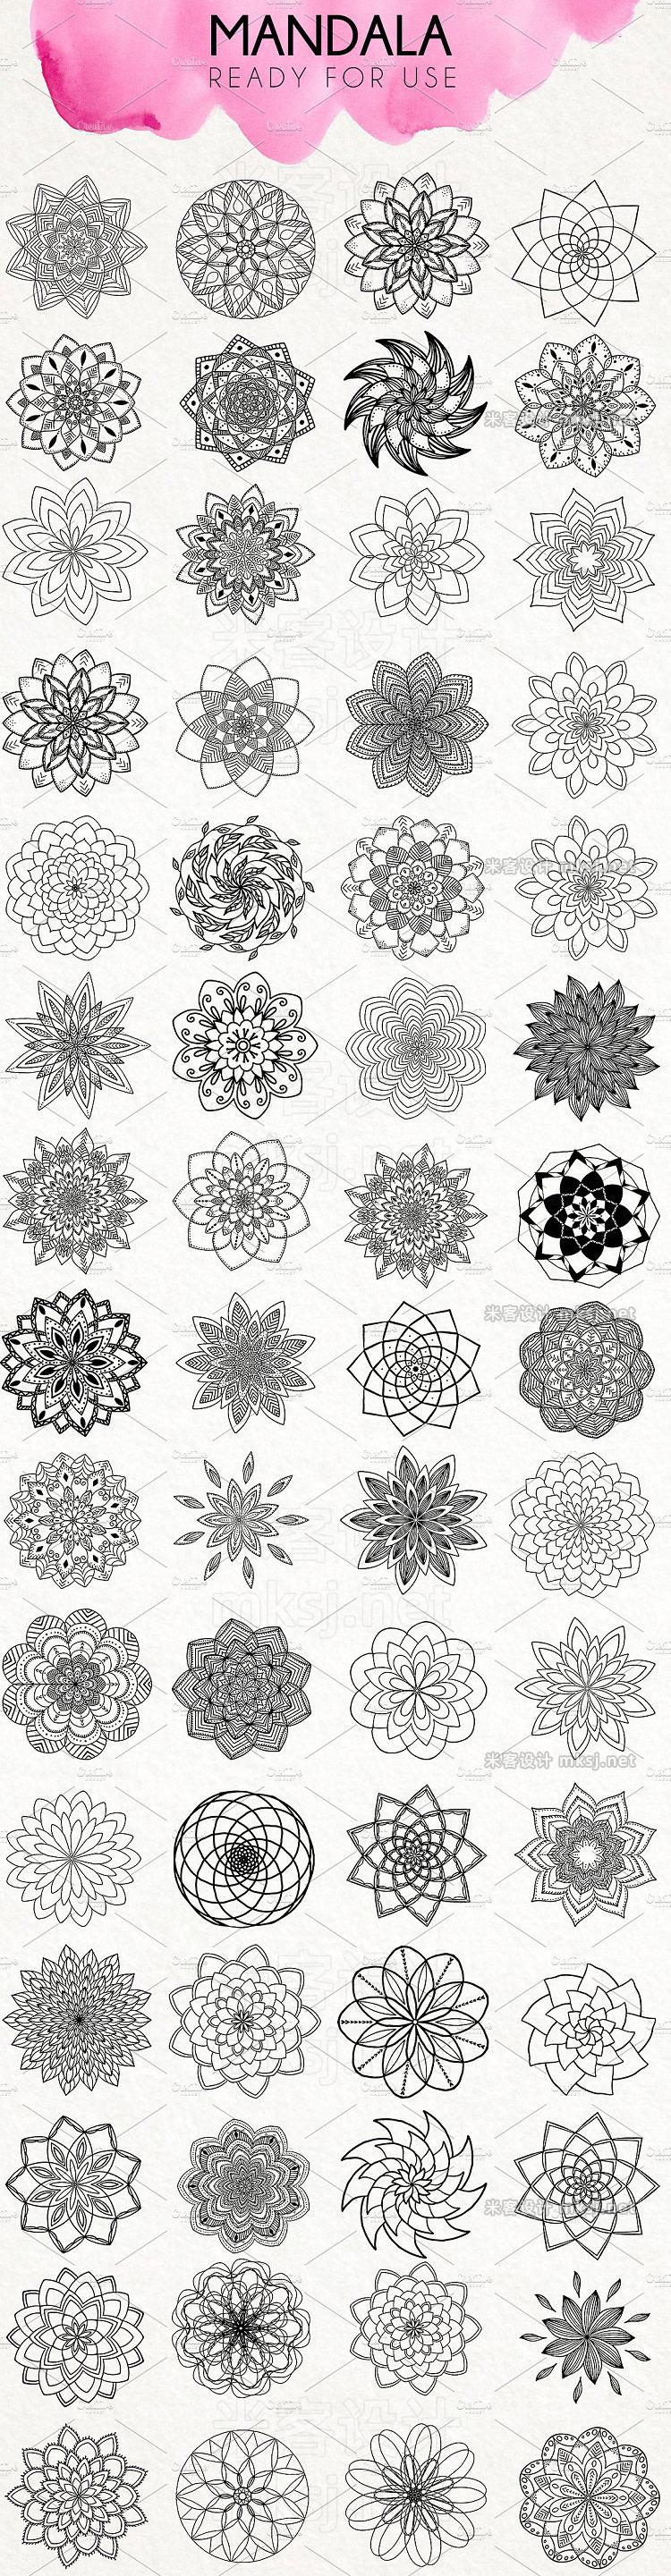 png素材 The Universe of Mandala